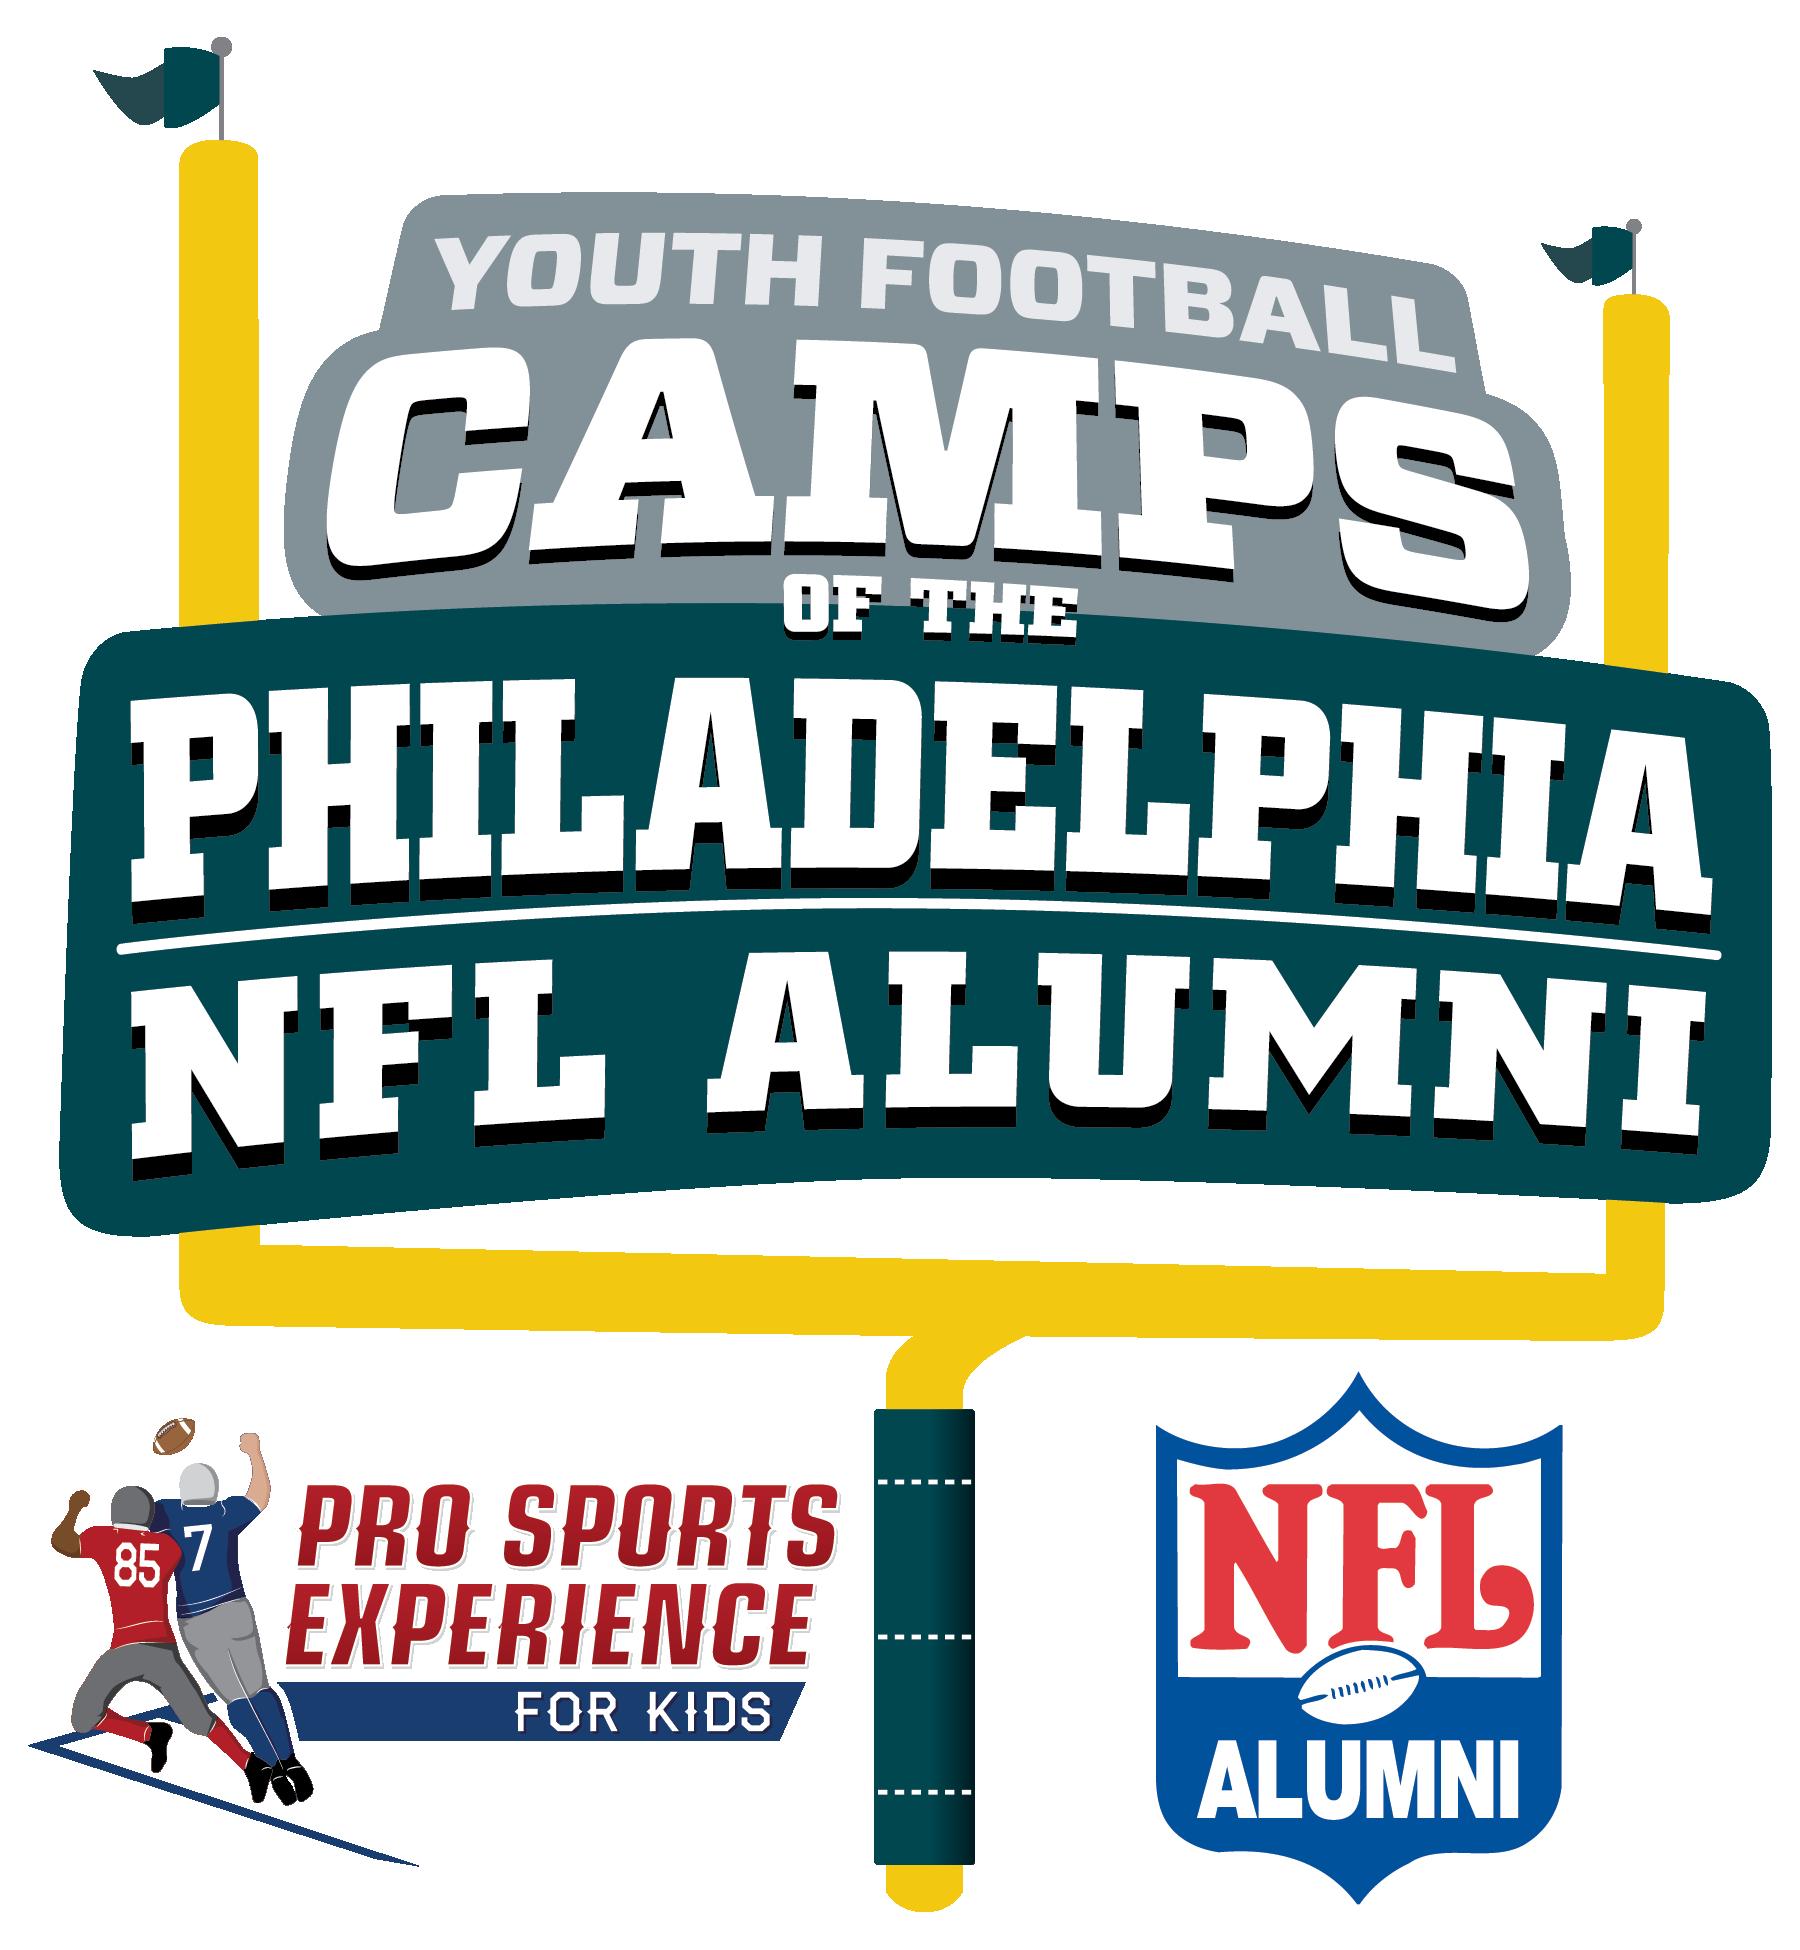 Philadelphia NFL Alumni Hero Youth Football Camps - Plymouth Meeting